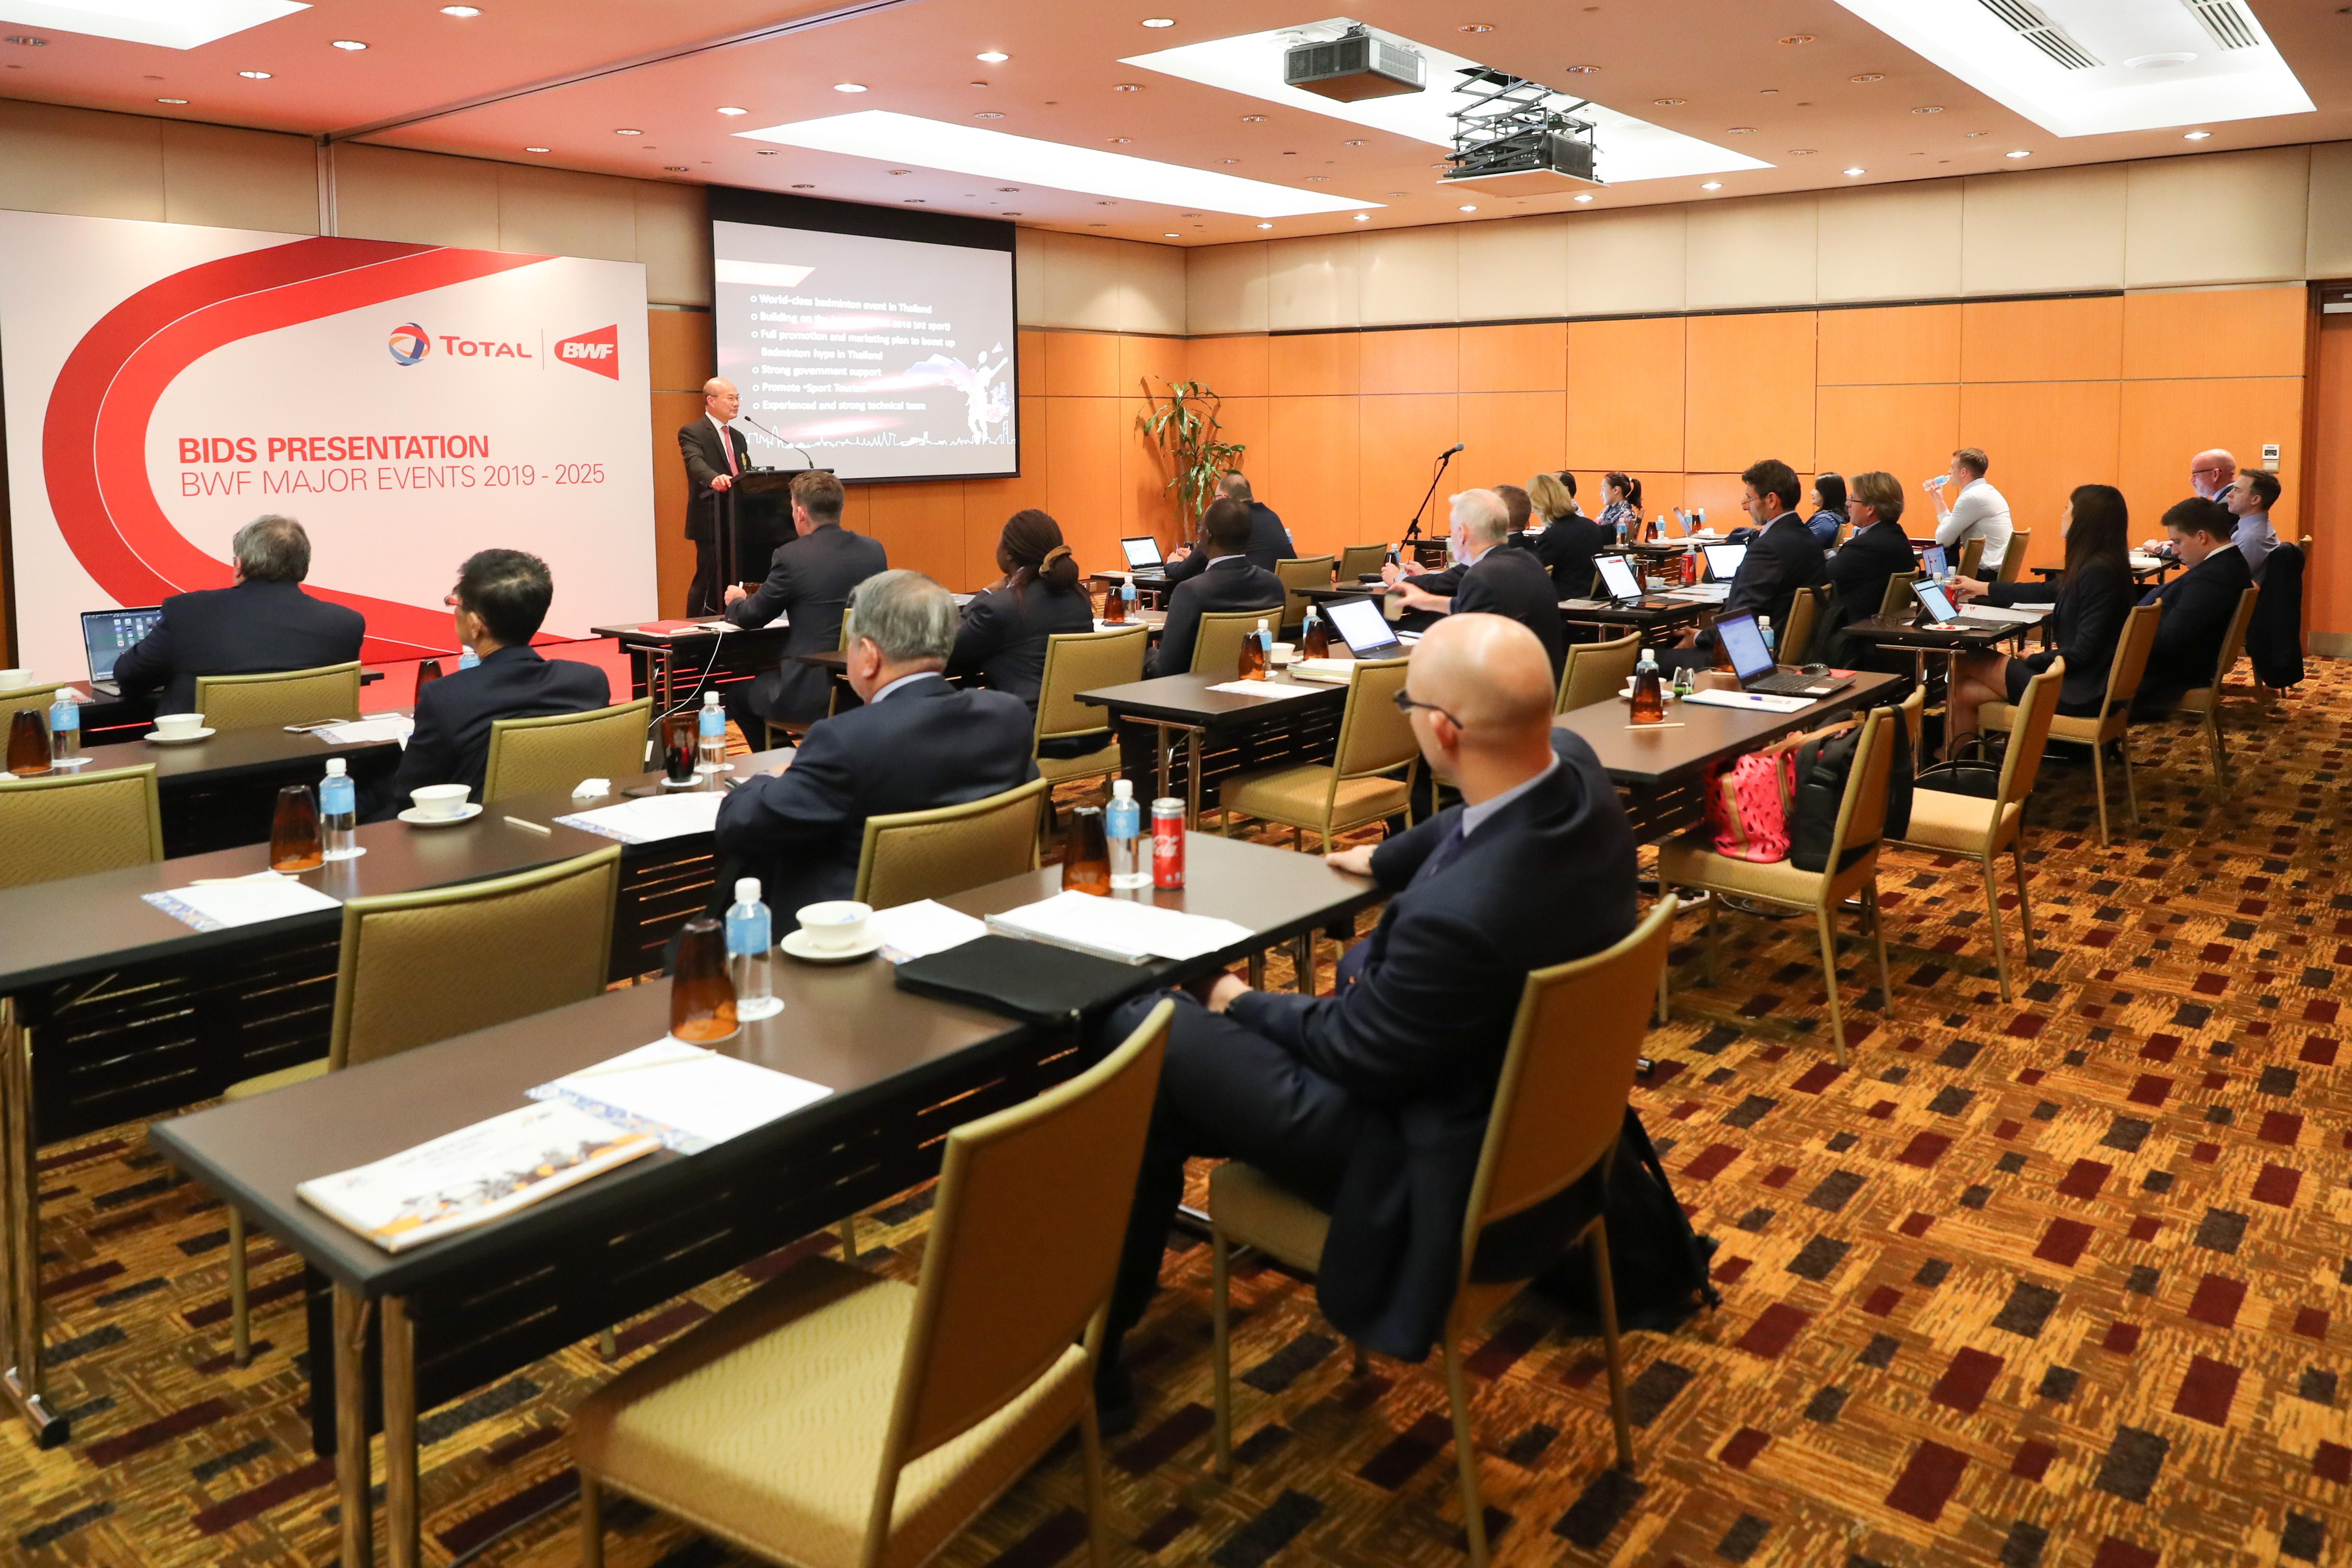 China and Spain take on major badminton hosting duties